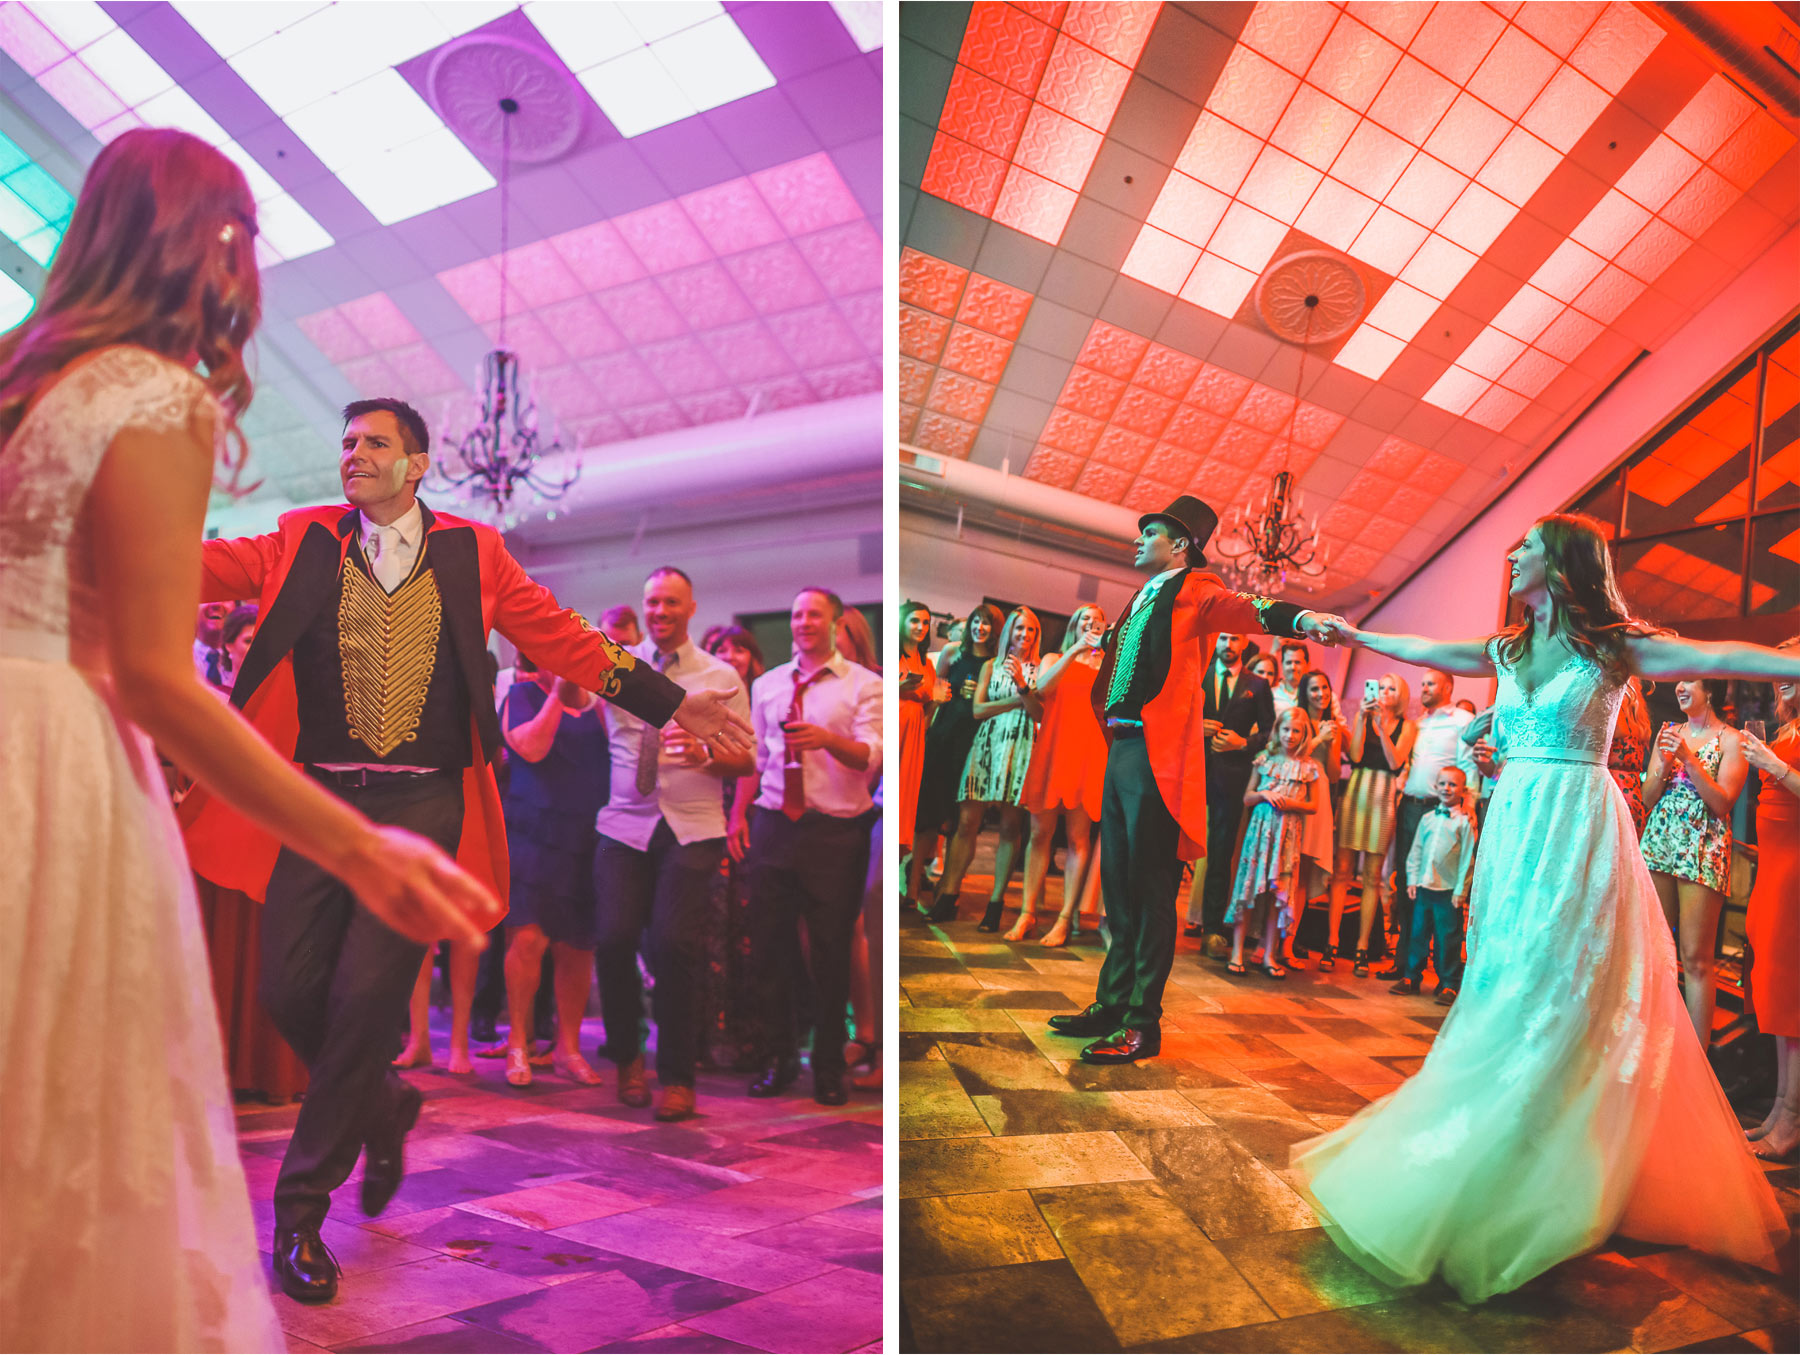 21-Weding-by-Vick-Photography-Minneapolis-Minnesota-Bavaria-Downs-Reception-Bride-Groom-Dance-Rebecca-and-Mark.jpg